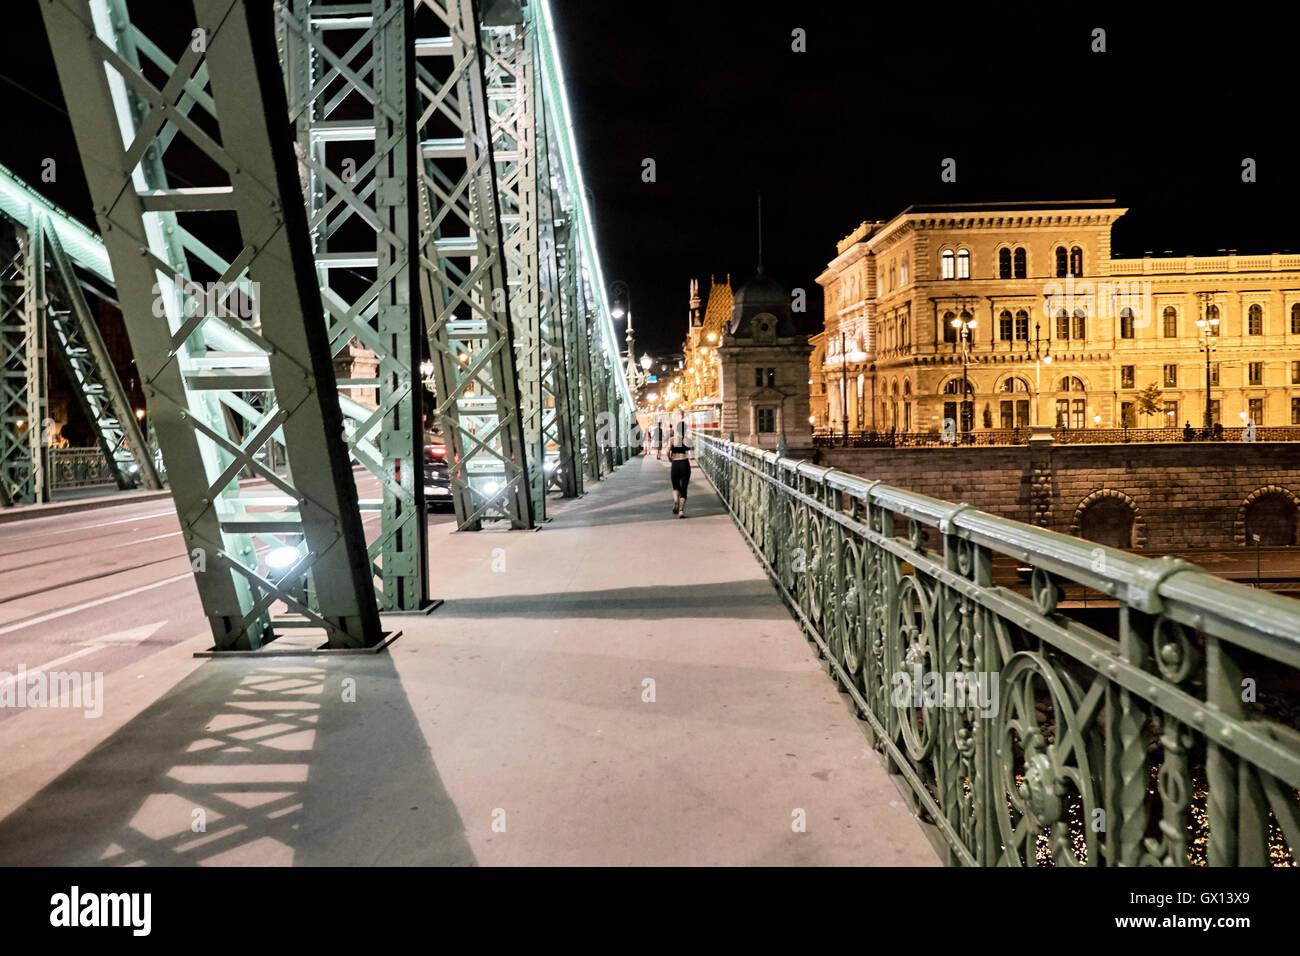 young woman runner running on city bridge road budapest liberty bridge night - Stock Image